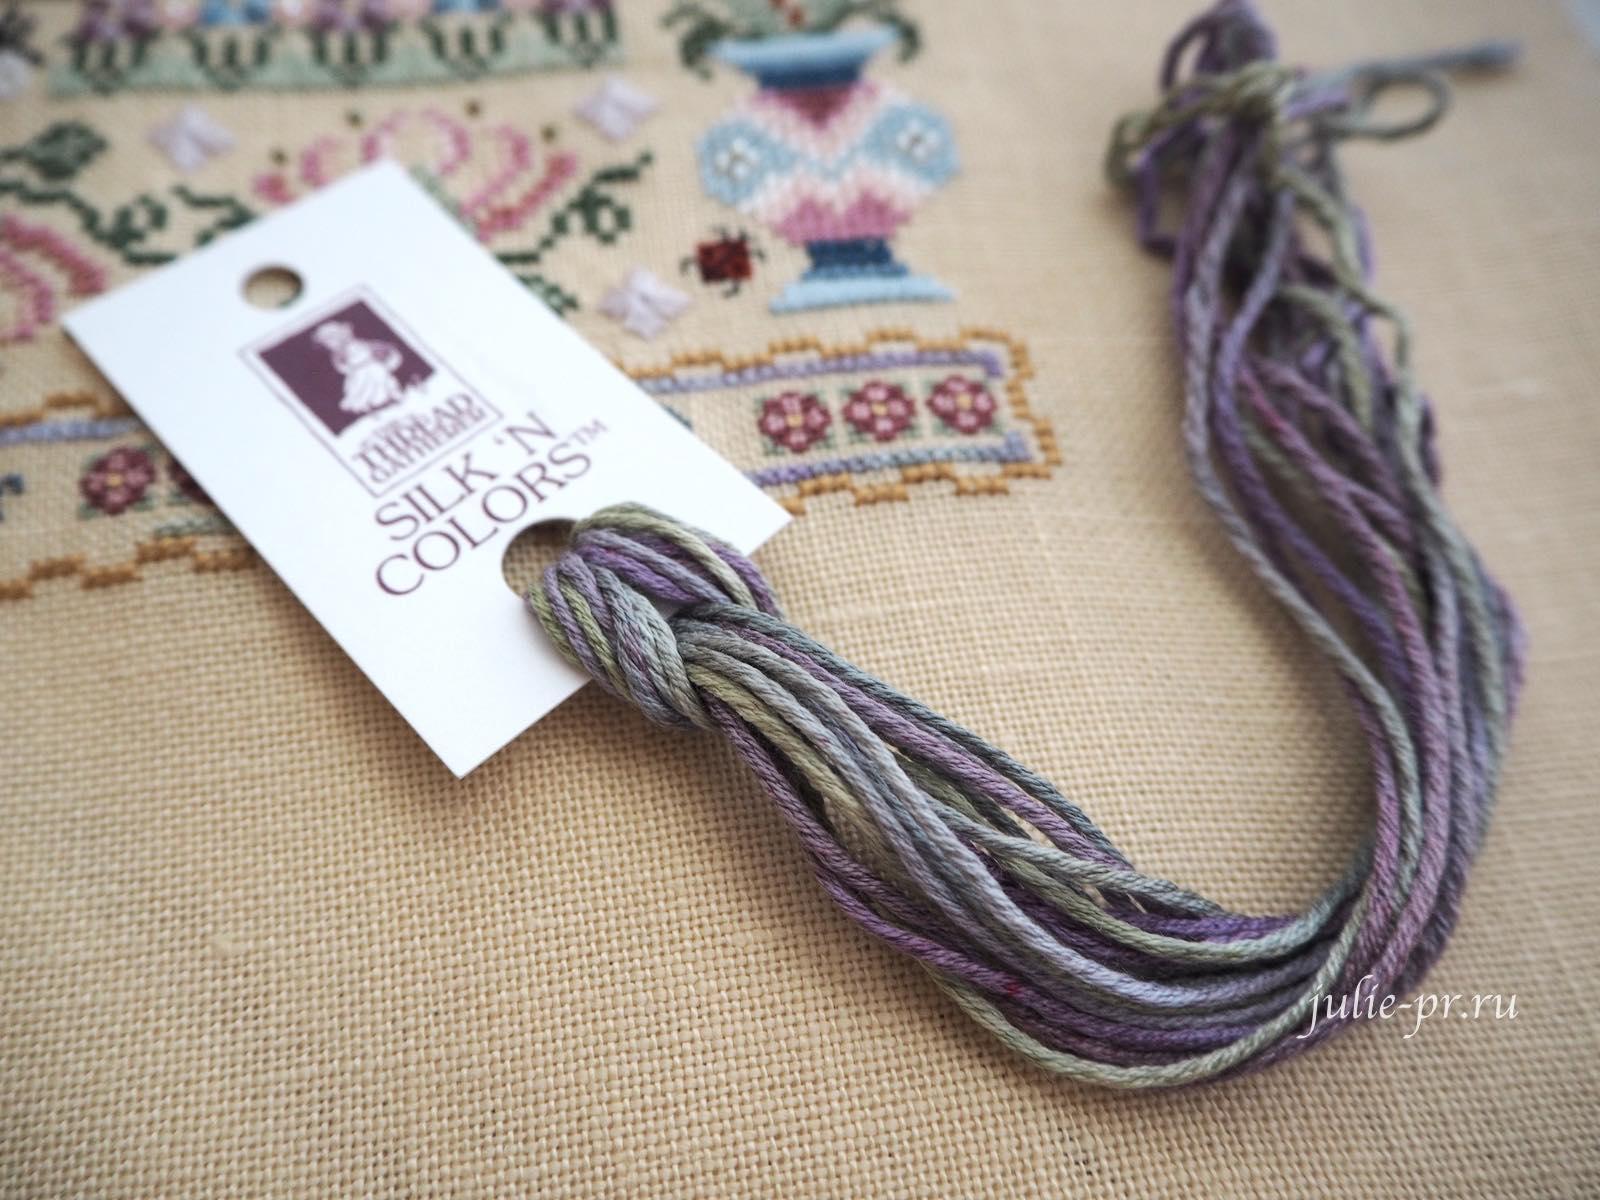 шелк ручного окрашивания Silk'n colors от The Thread Gatherer, Wild Violets (номер SNC 112)